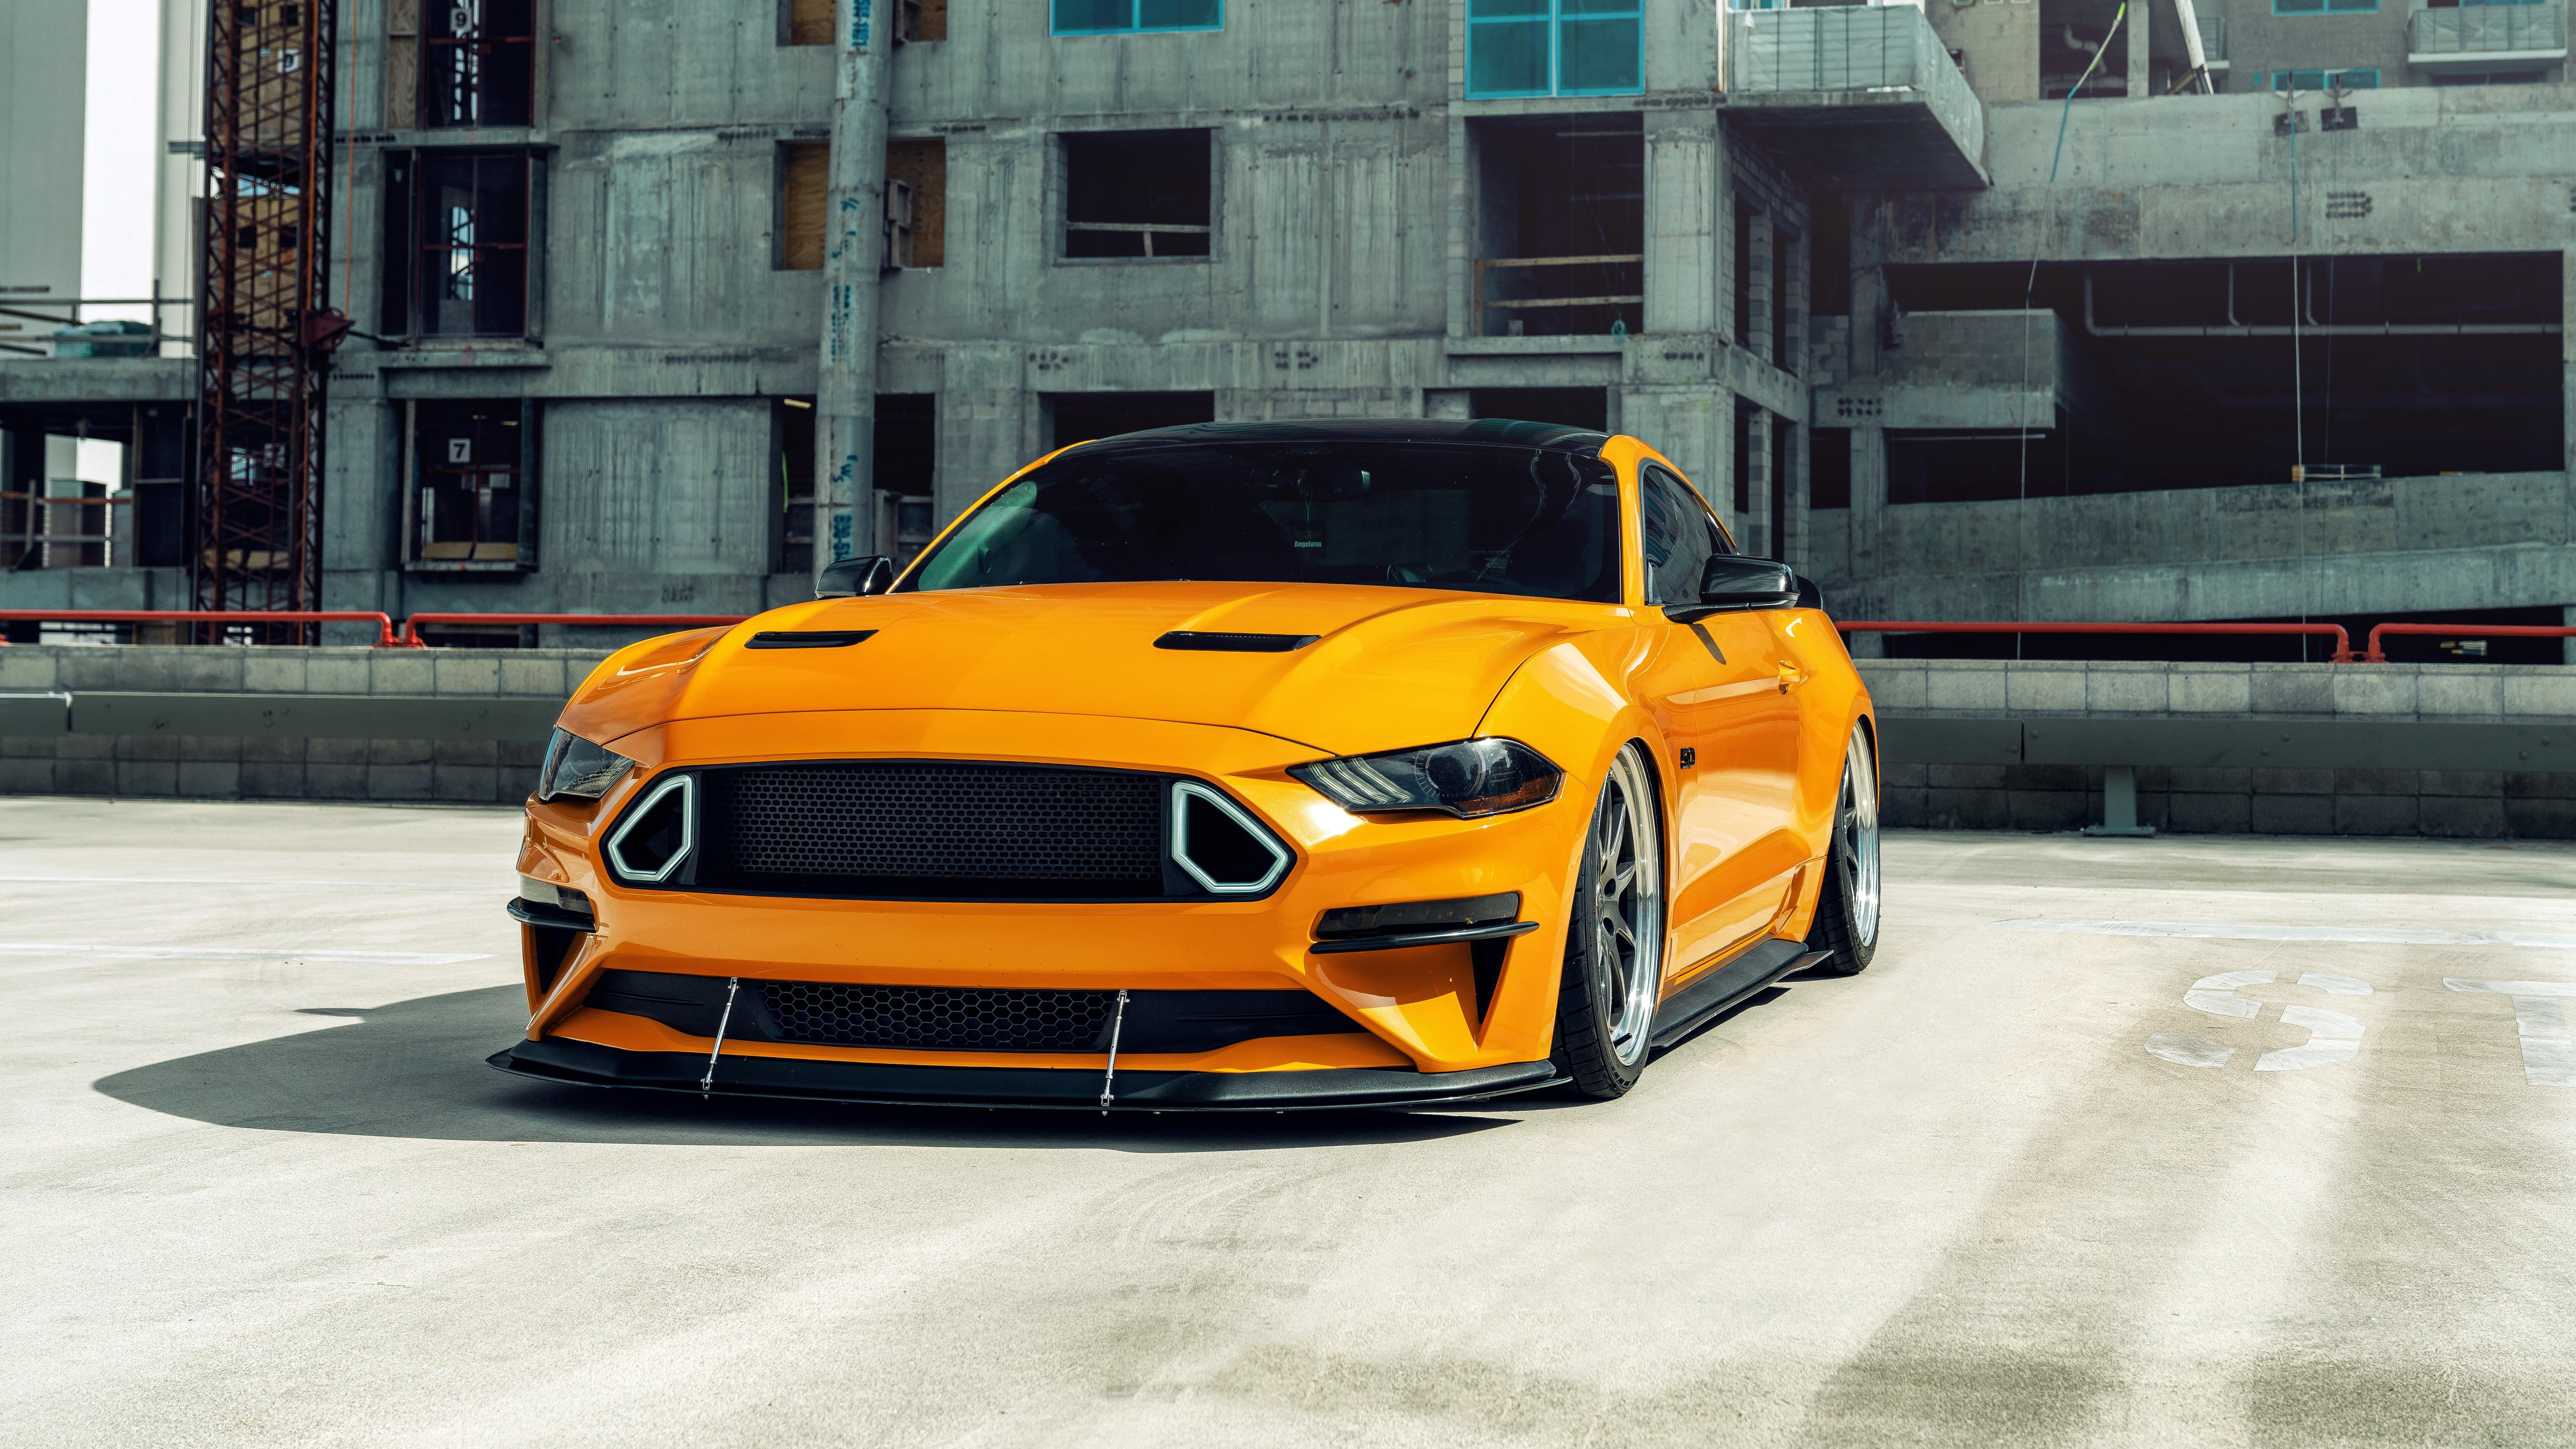 Ford Mustang GT 8K Wallpaper | HD Wallpapers